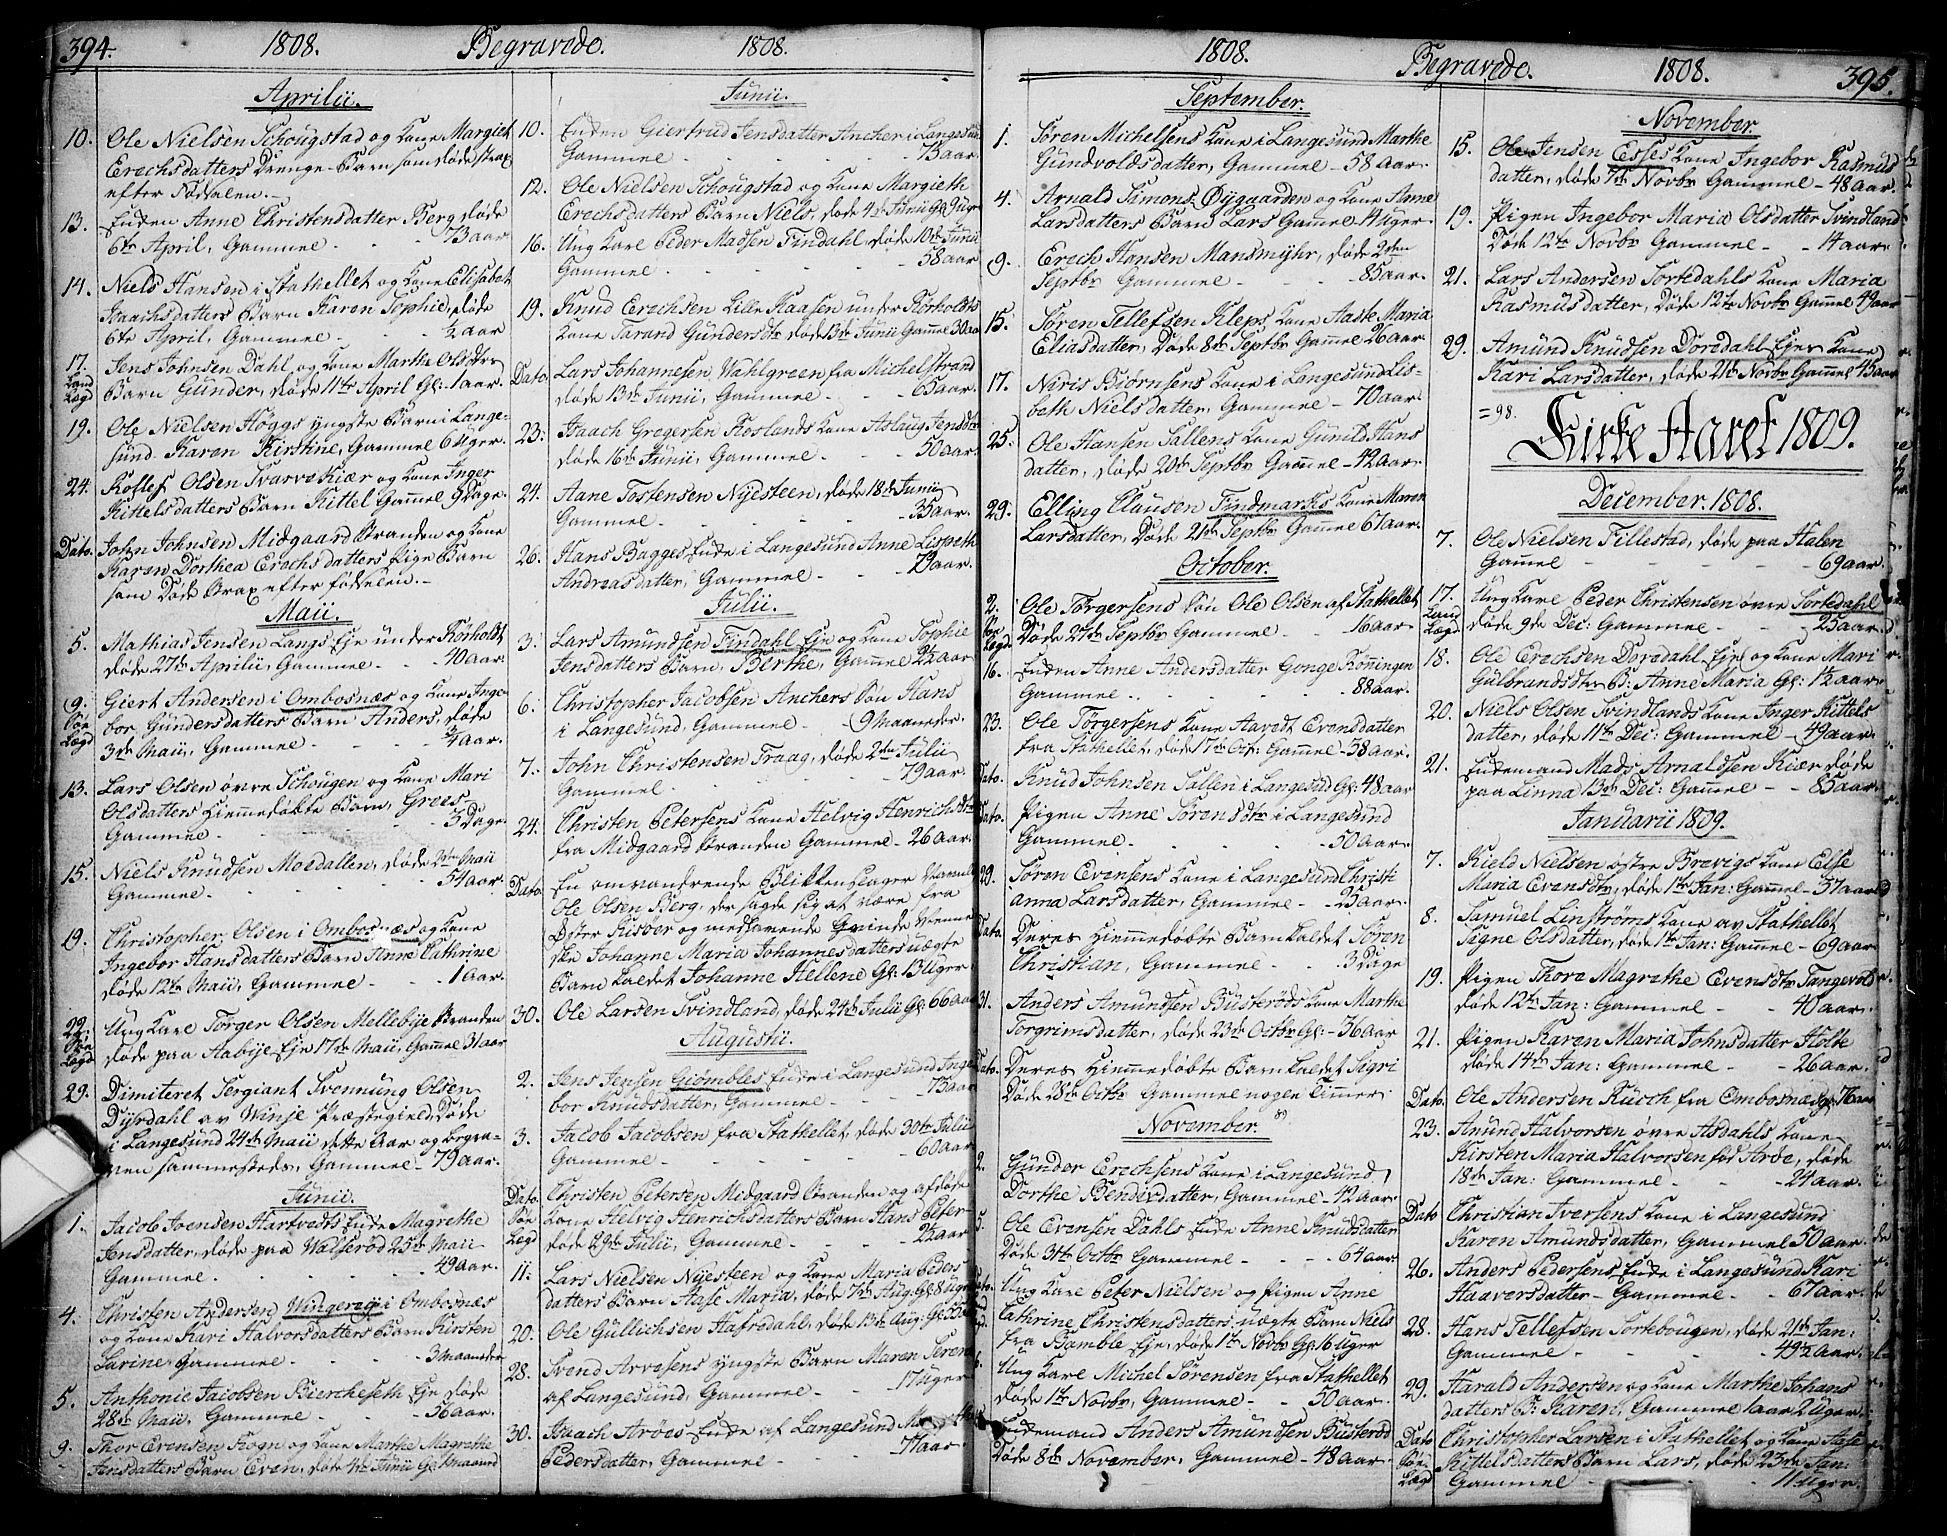 SAKO, Bamble kirkebøker, F/Fa/L0002: Ministerialbok nr. I 2, 1775-1814, s. 394-395